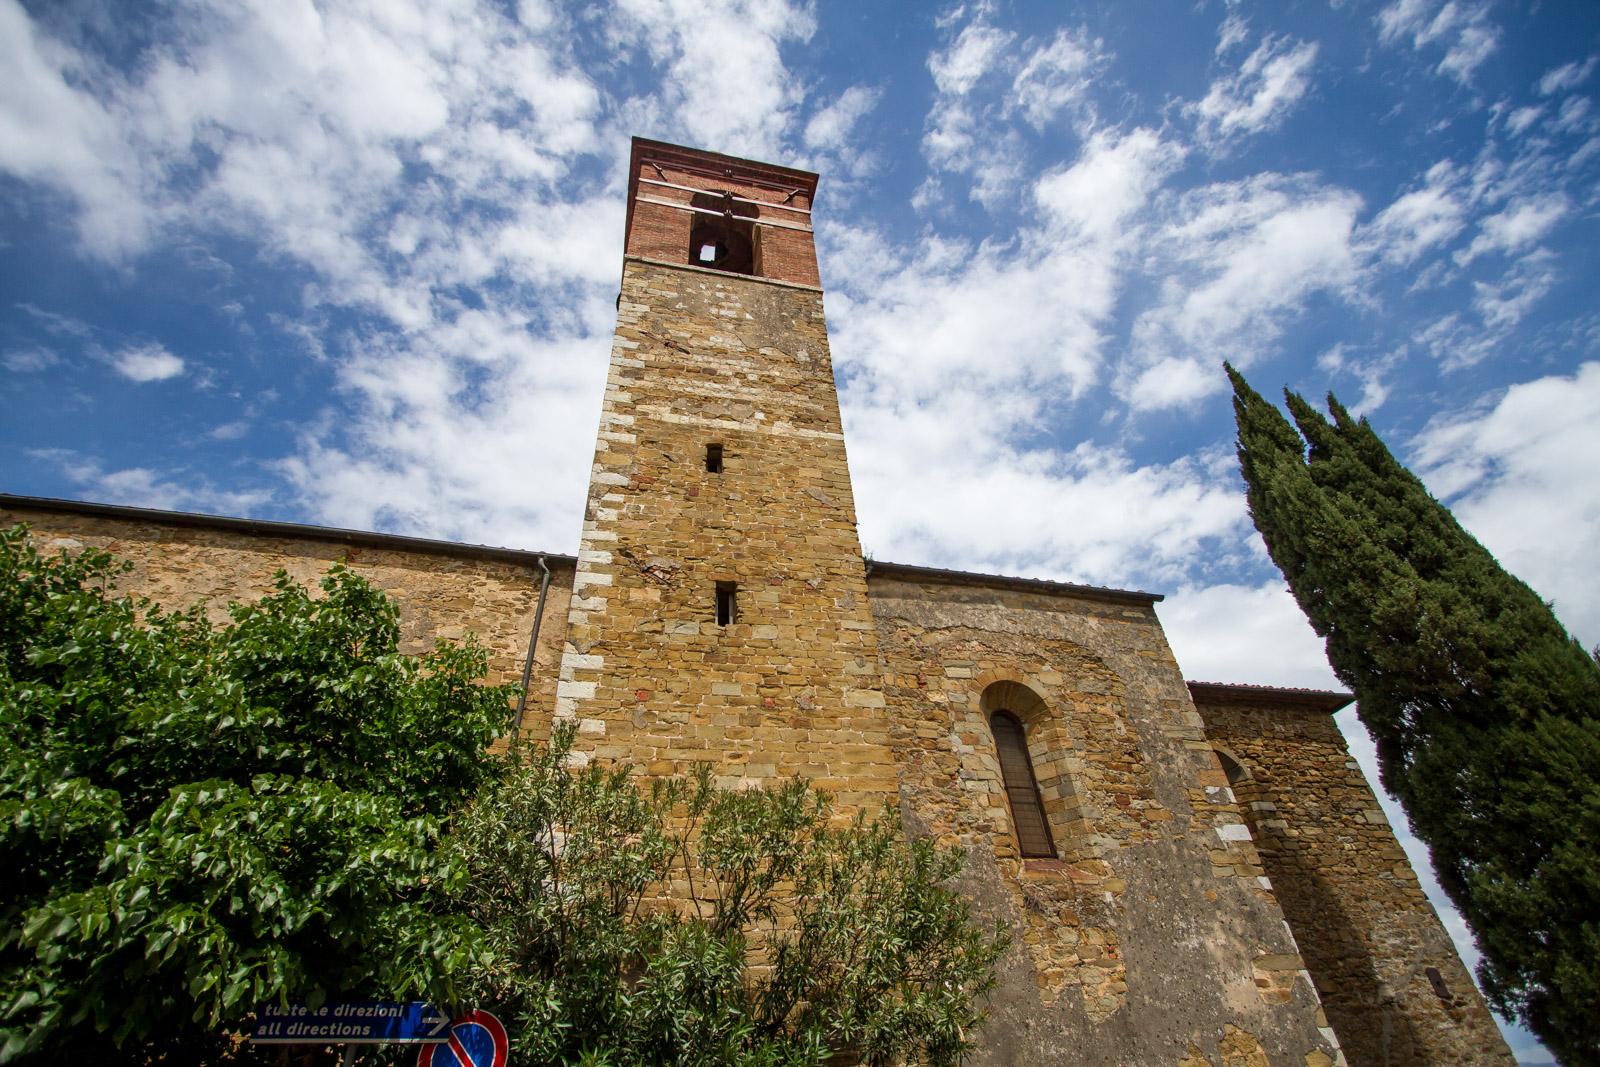 The church tower.